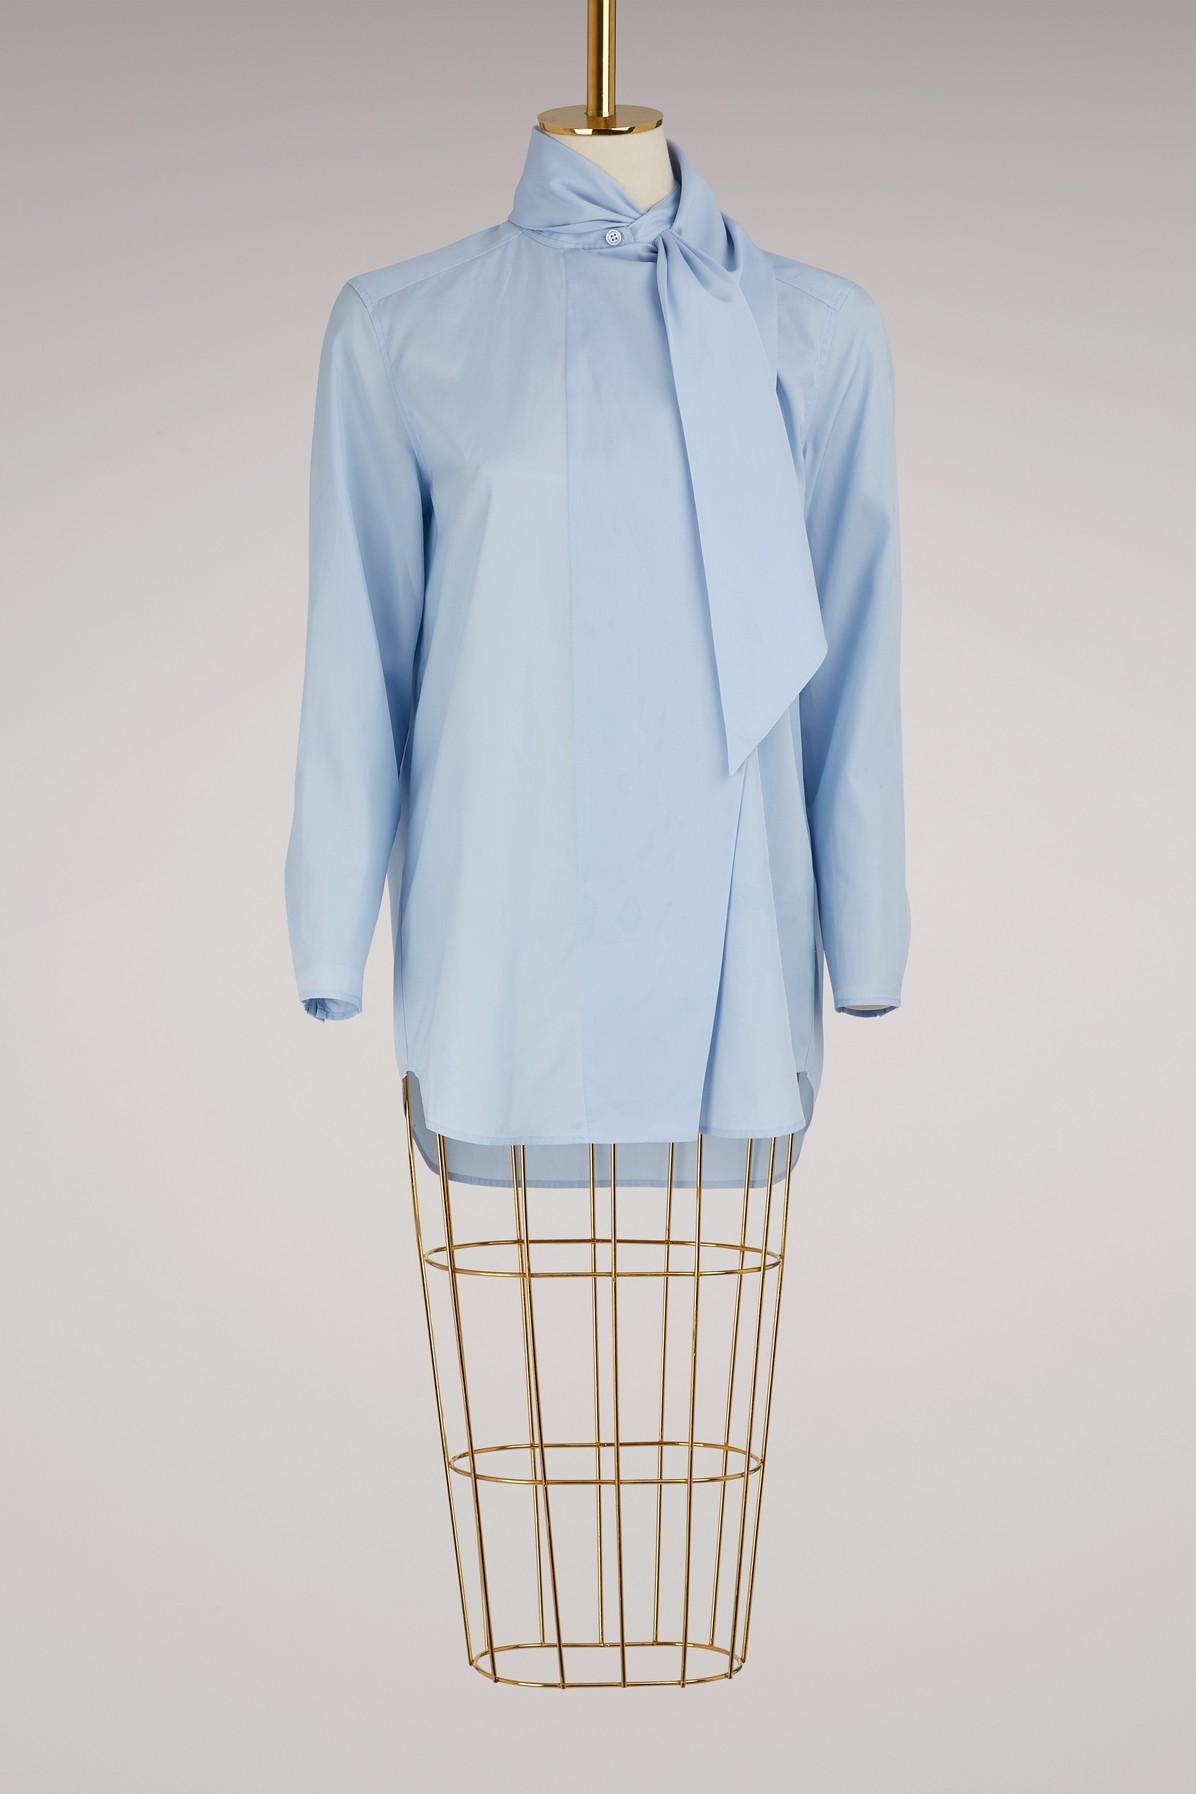 Acne Studios Cotton Dry Pop Bianca Shirt In Sky Blue